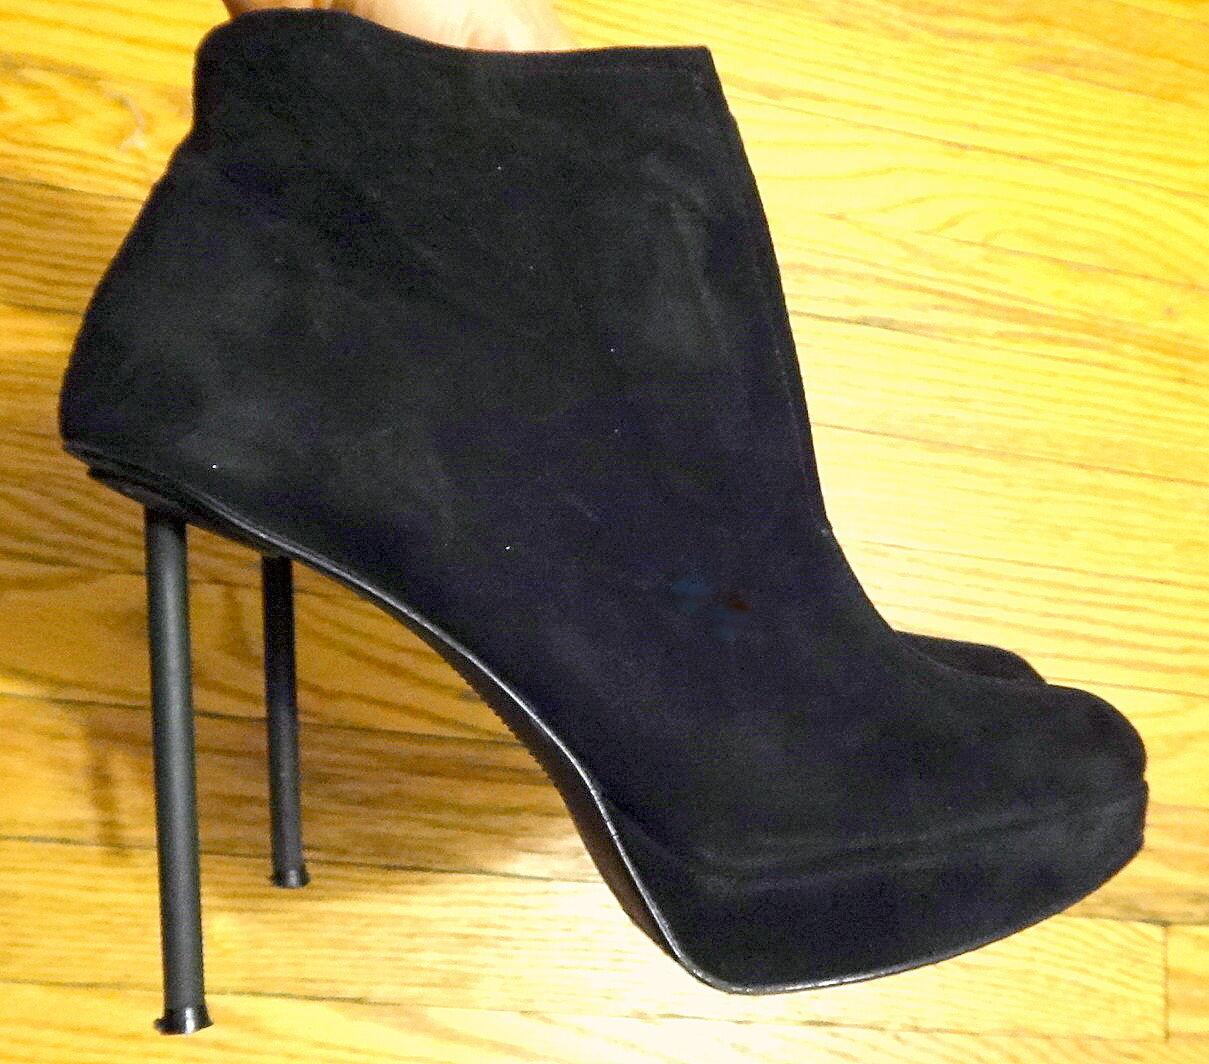 SAUCONY Mujer Gamuza,Tela S60424 11 Zapatos púrpura